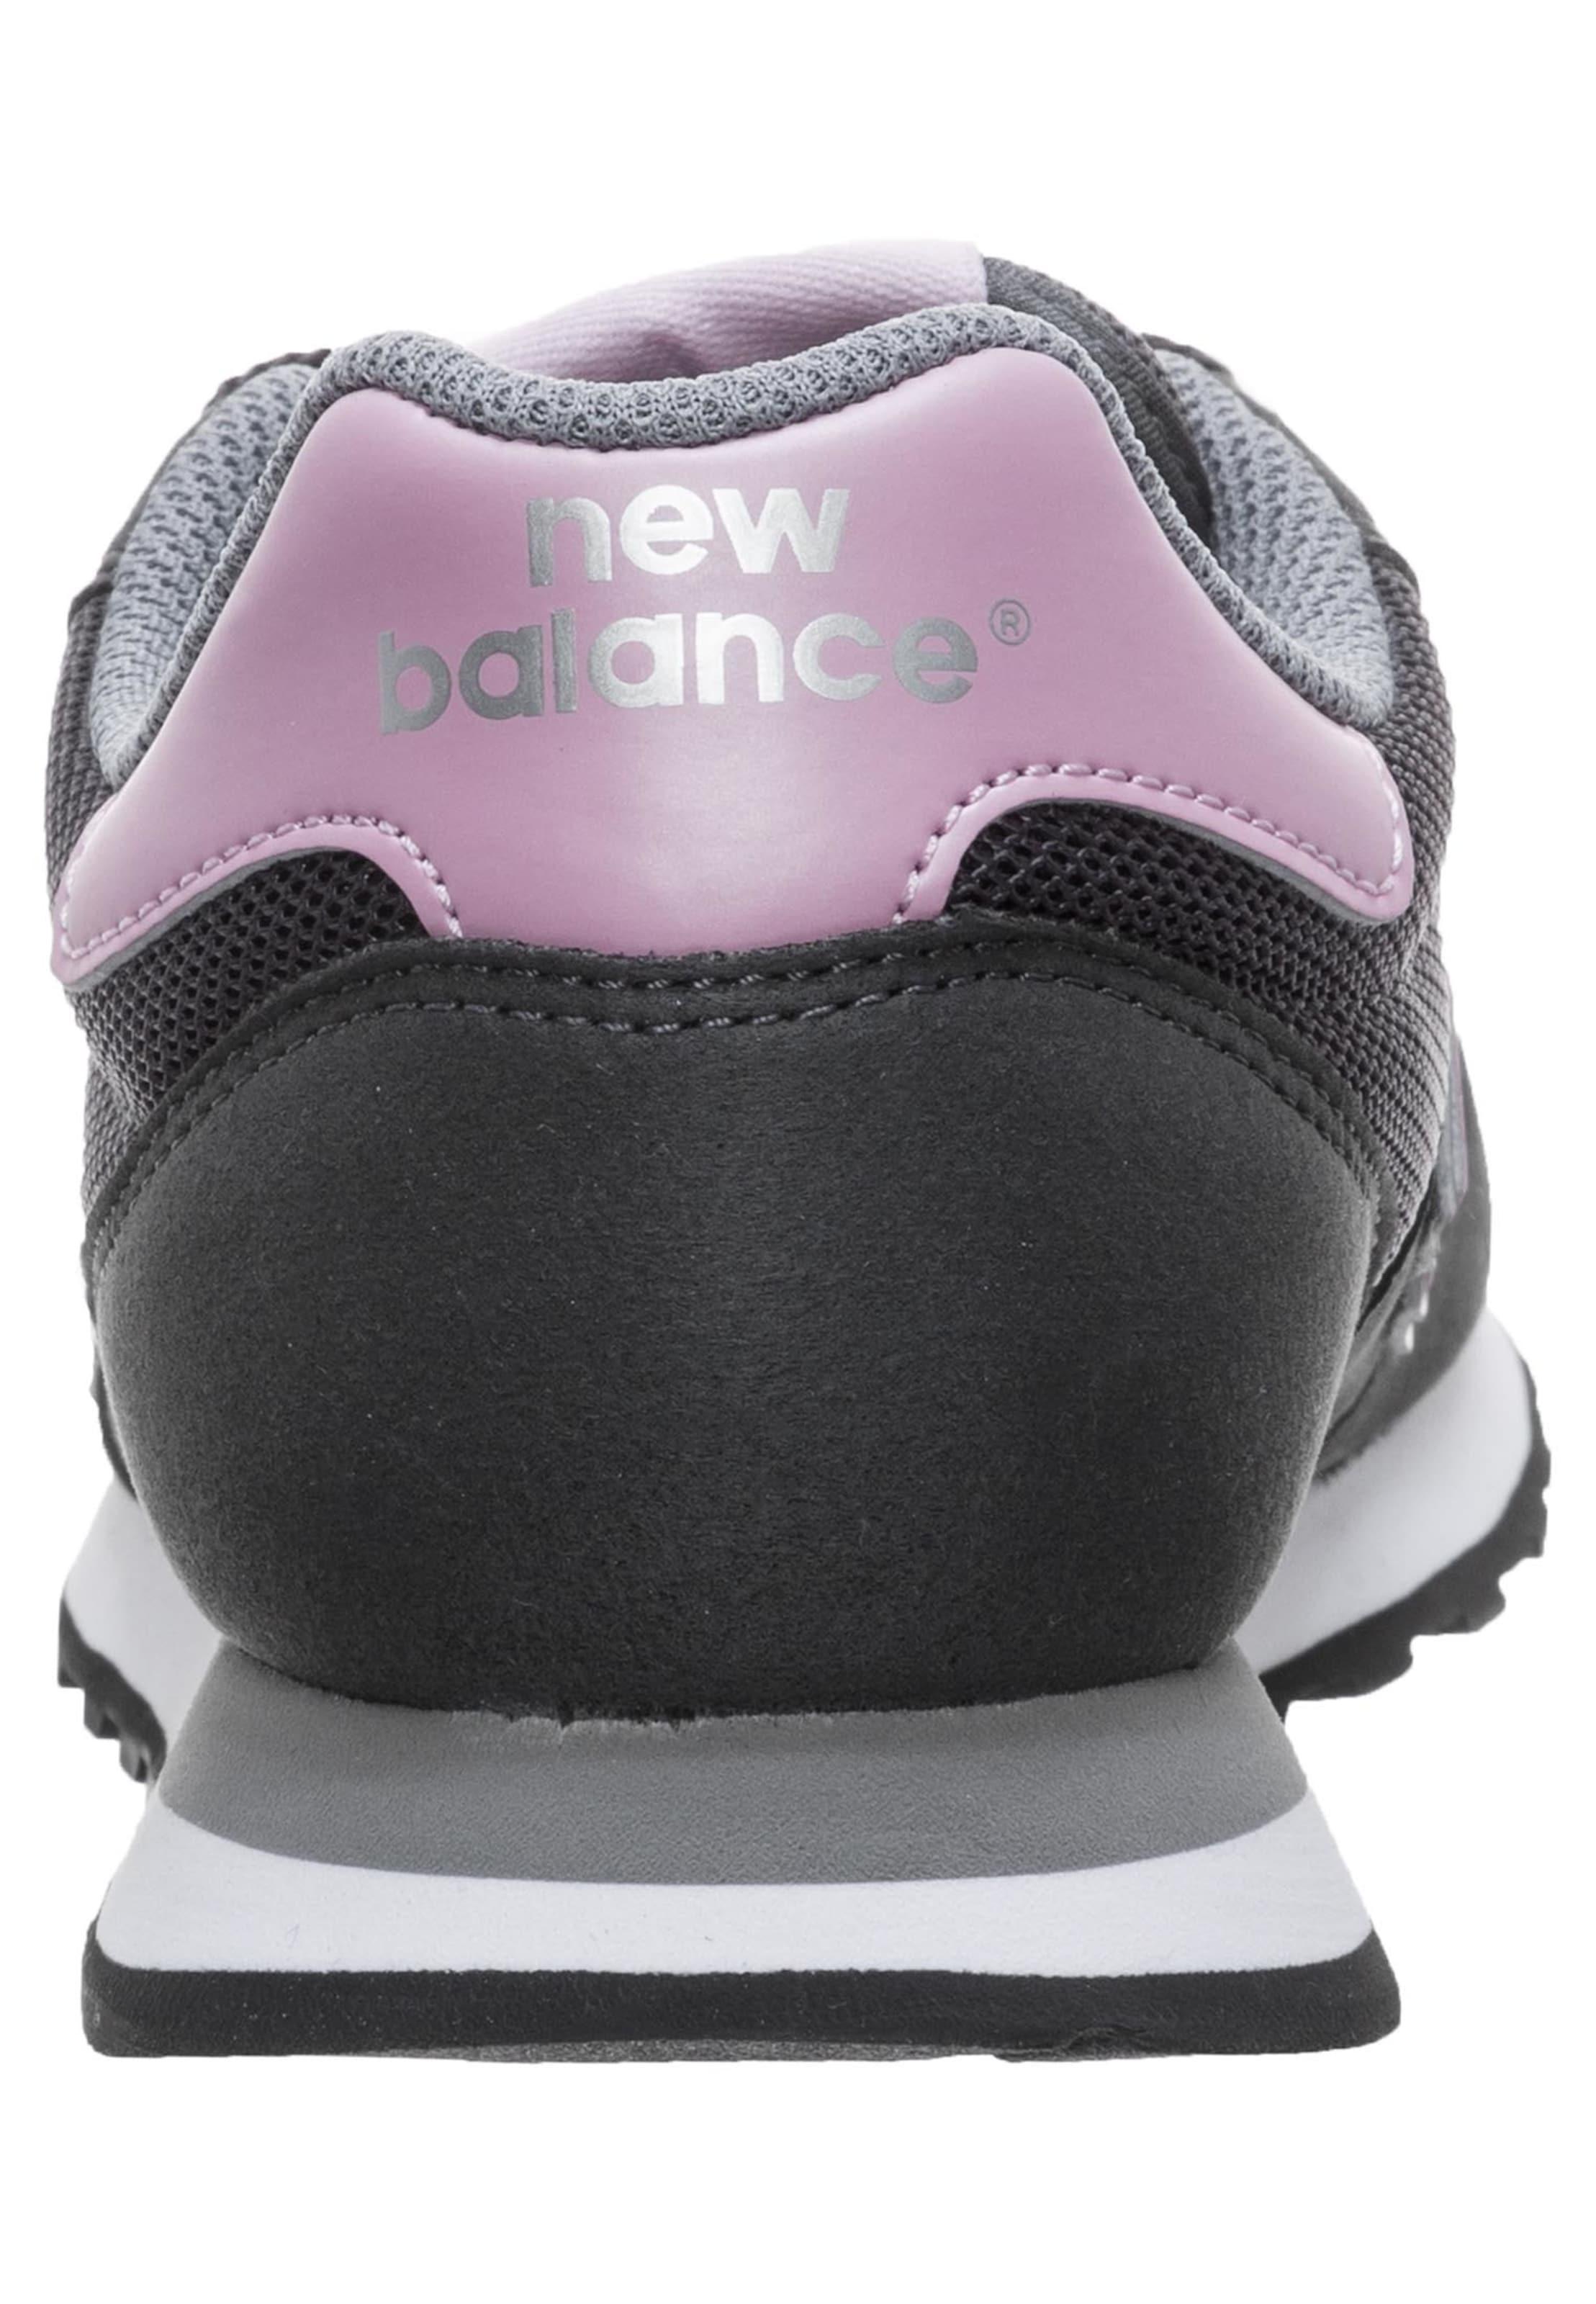 'gw500 DunkelgrauRosa Sneaker Balance New B' In dthQsrC